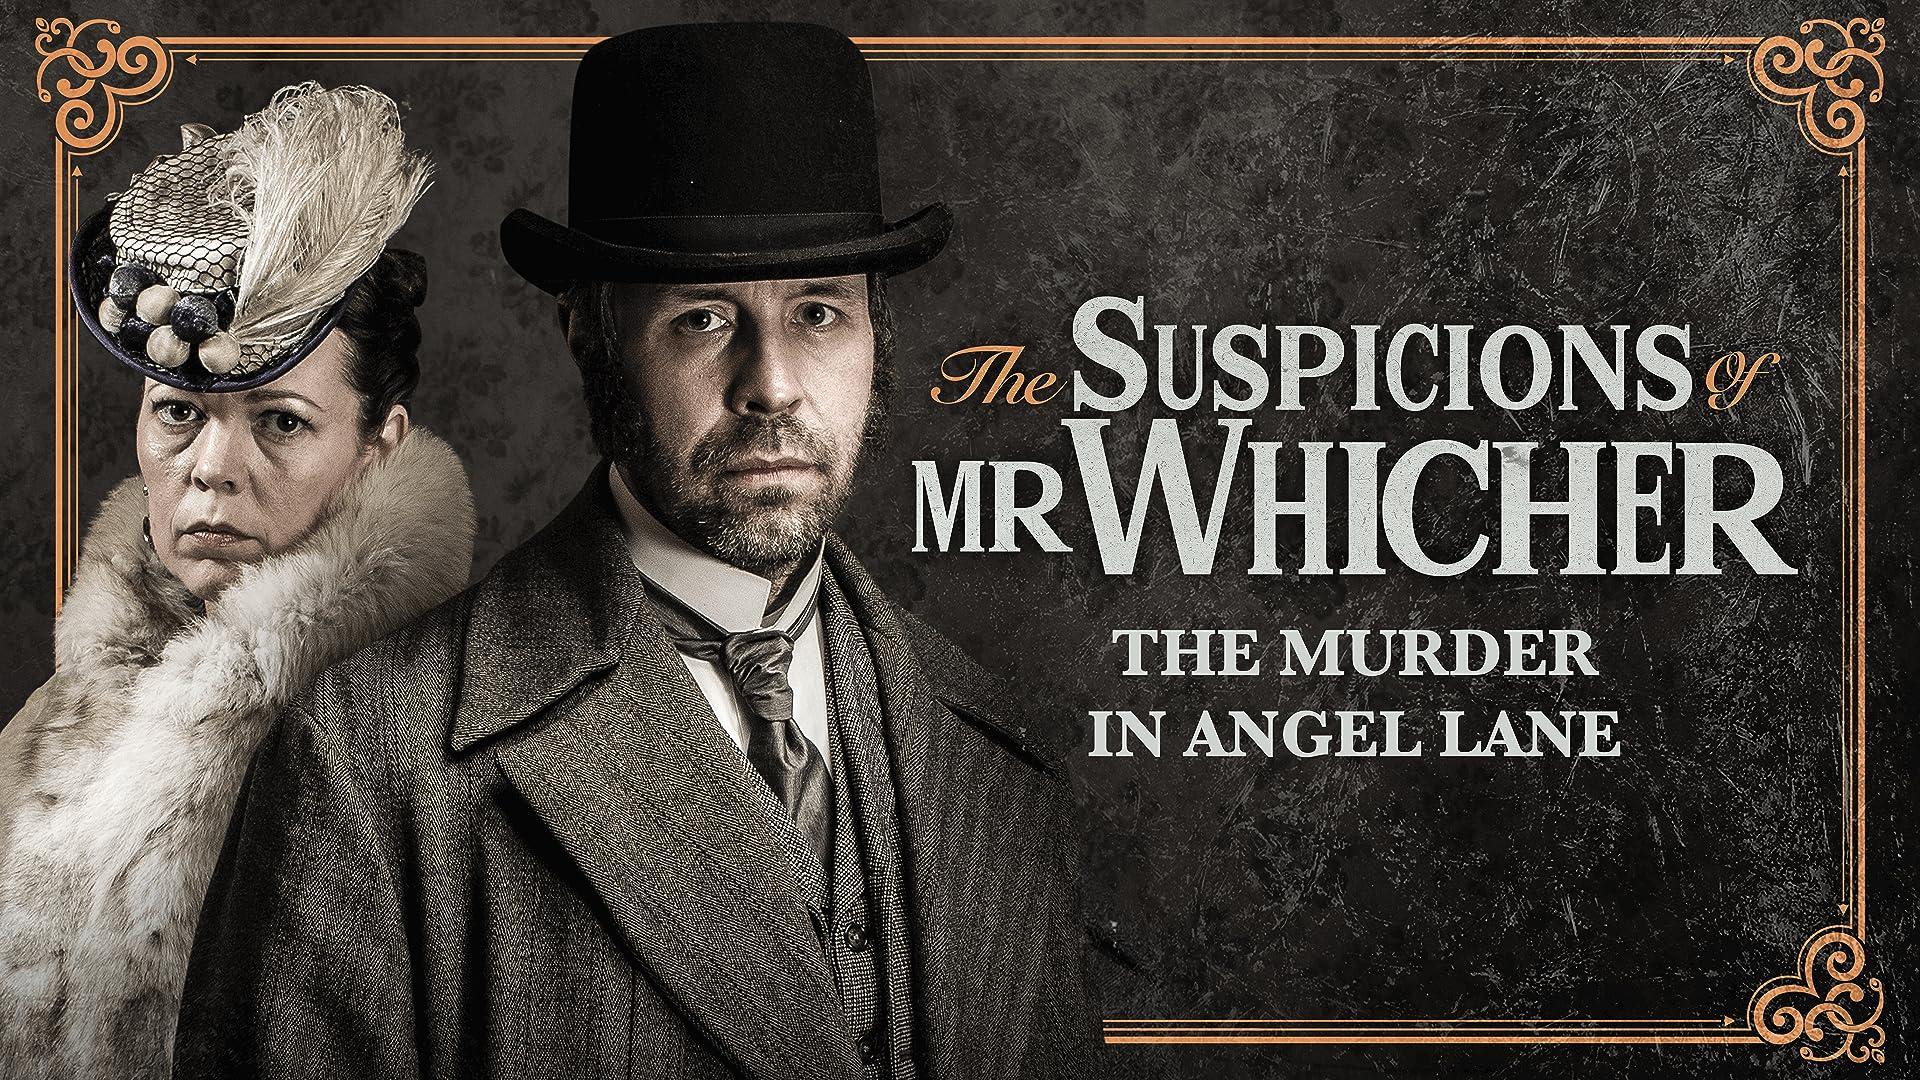 The Suspicions Of Mr. Whicher: The Murder on Angel Lane